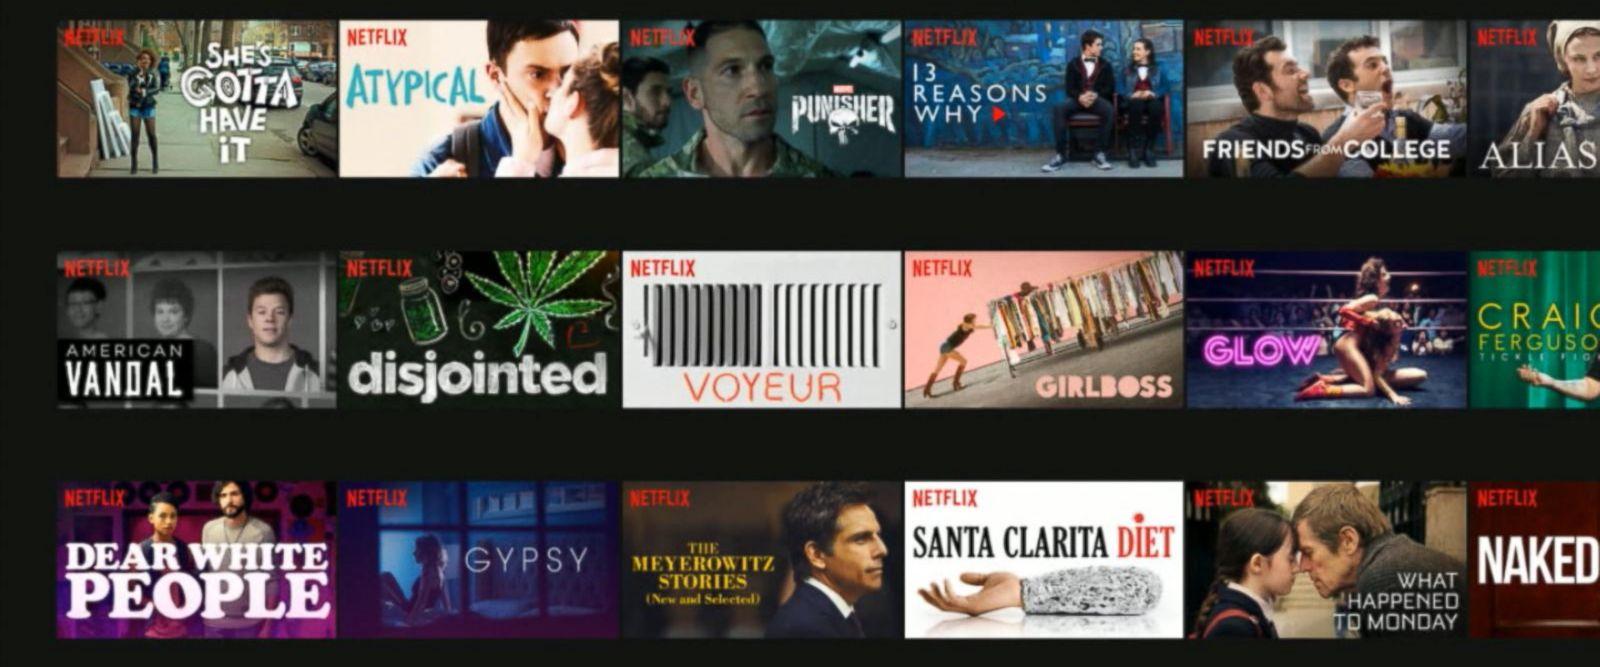 VIDEO: 'American Vandal' most binge-watched show: Netflix